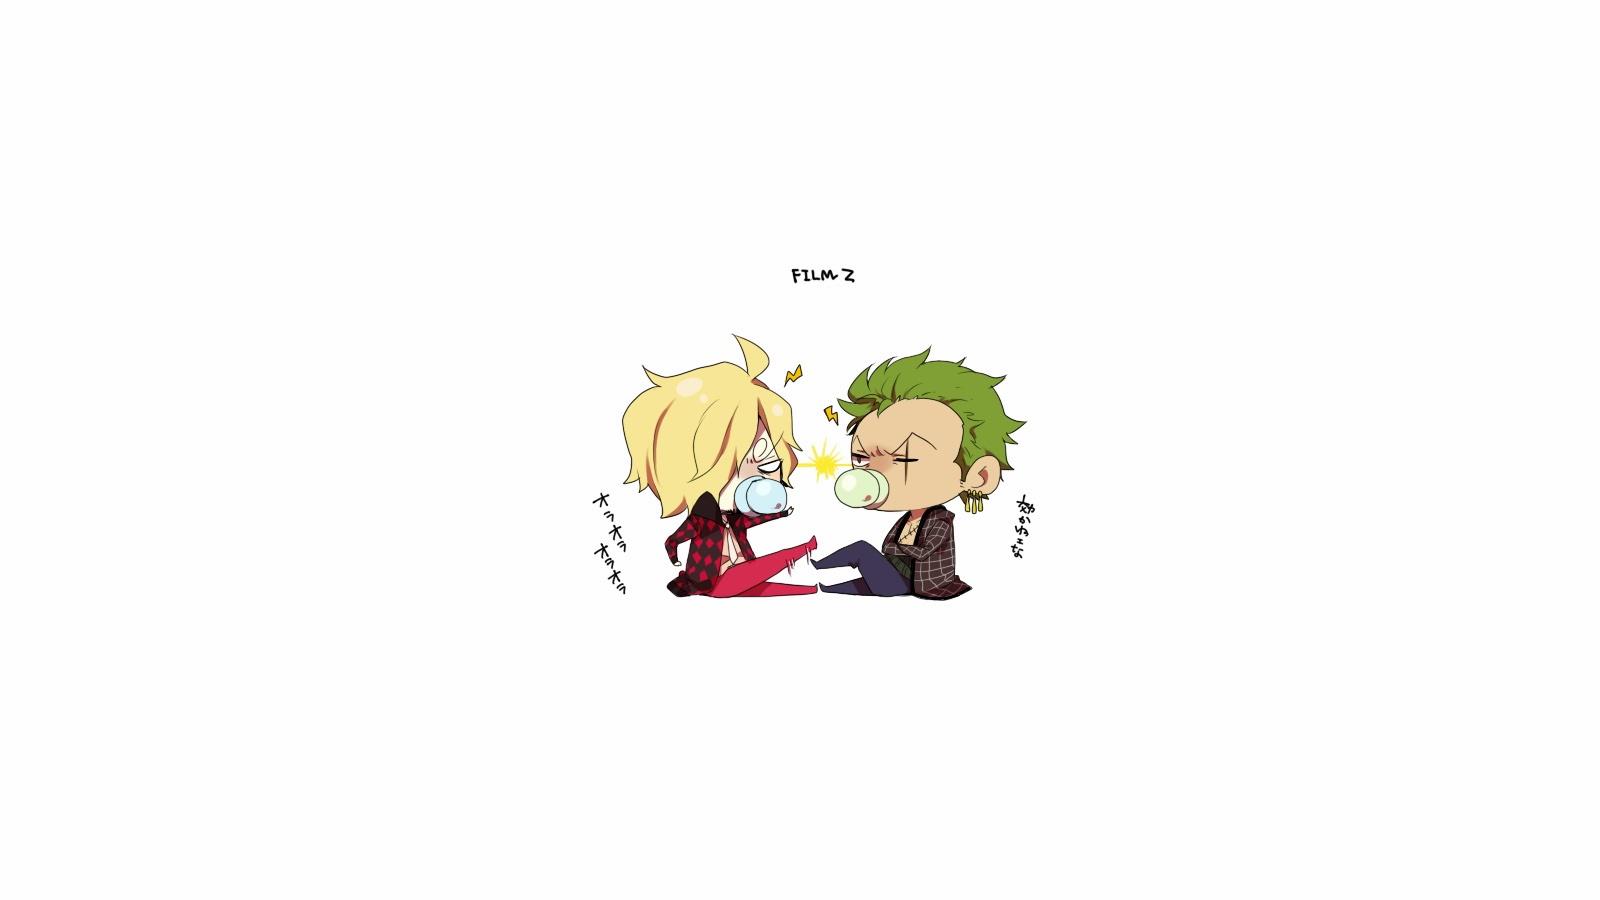 zoro and sanji cute chibi one piece anime hd wallpaper 1600x900 2t 1600x900